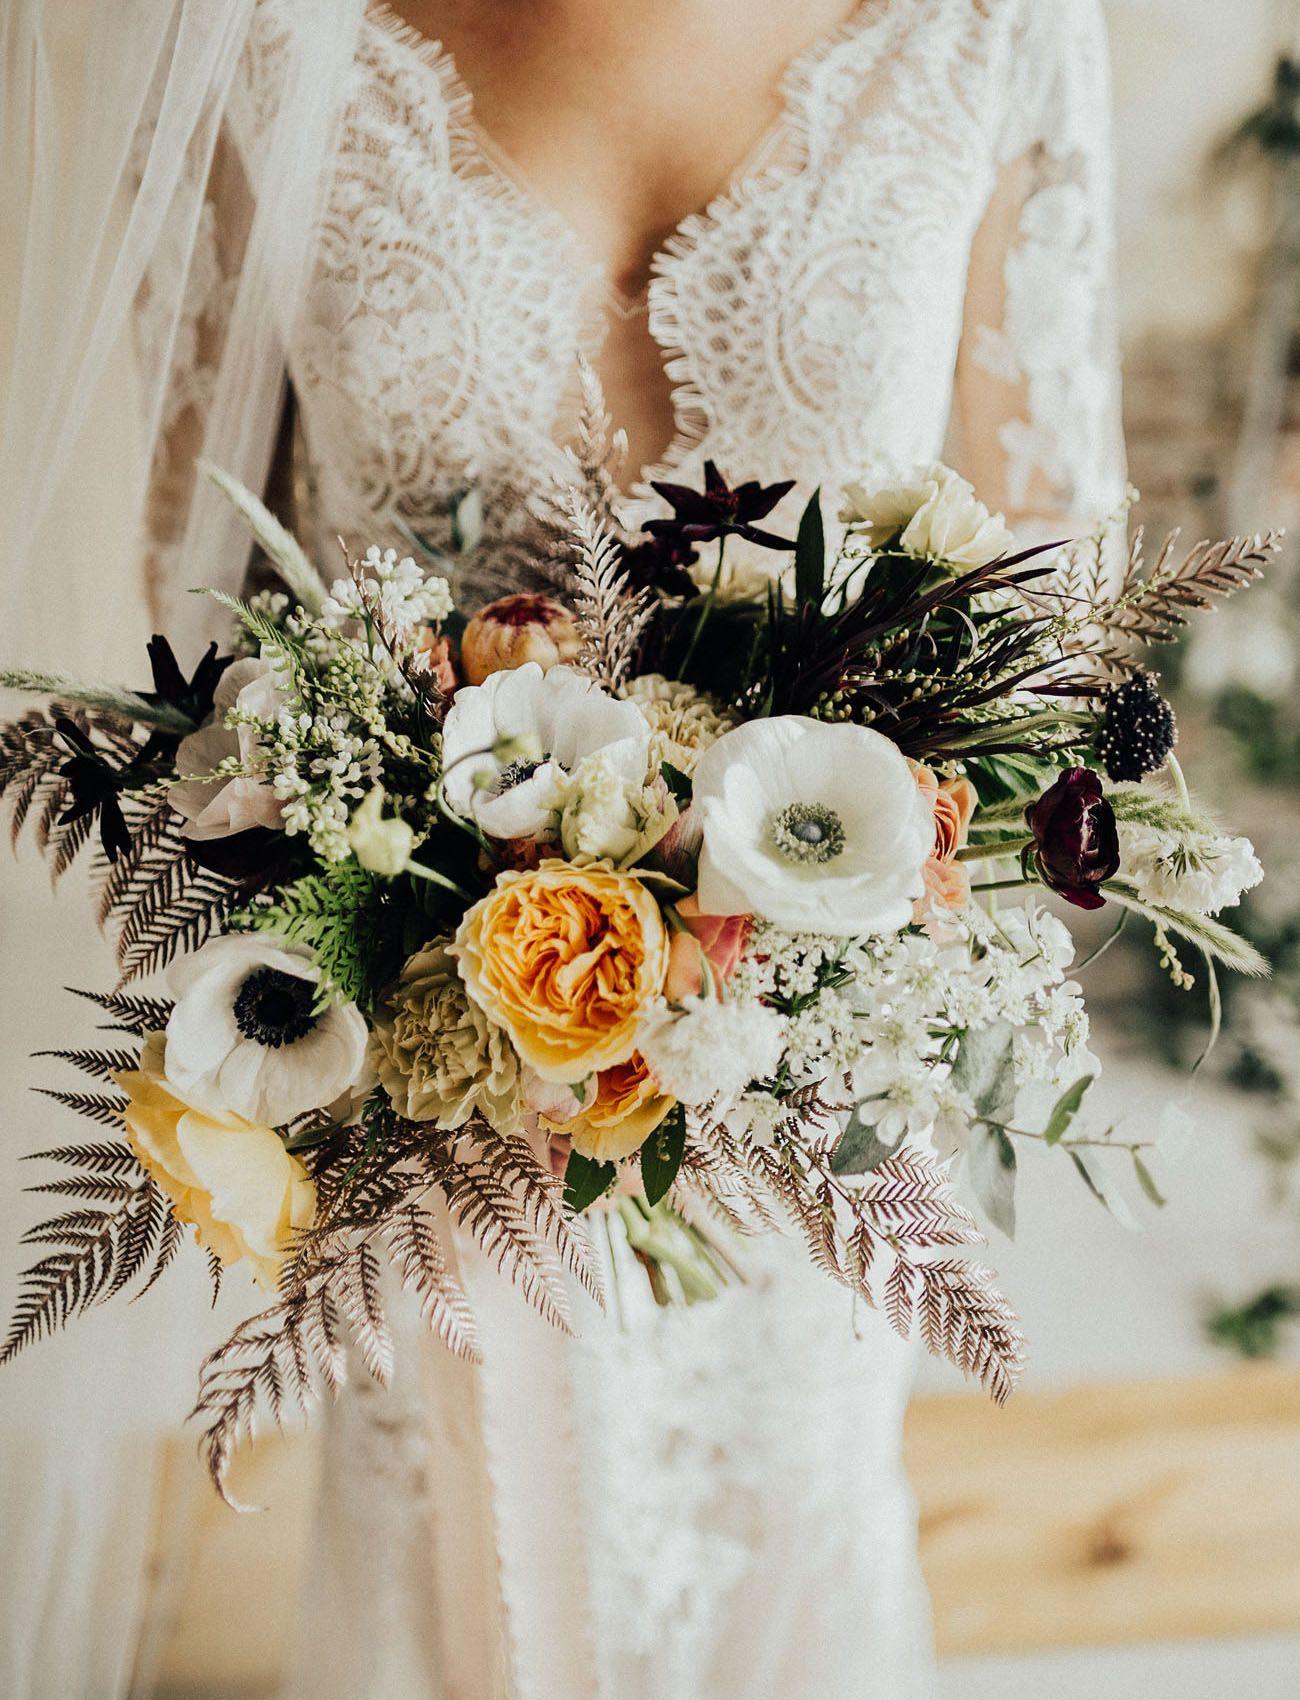 Elegantly Emerald A Modern Take On A Vintage Inspired Wedding